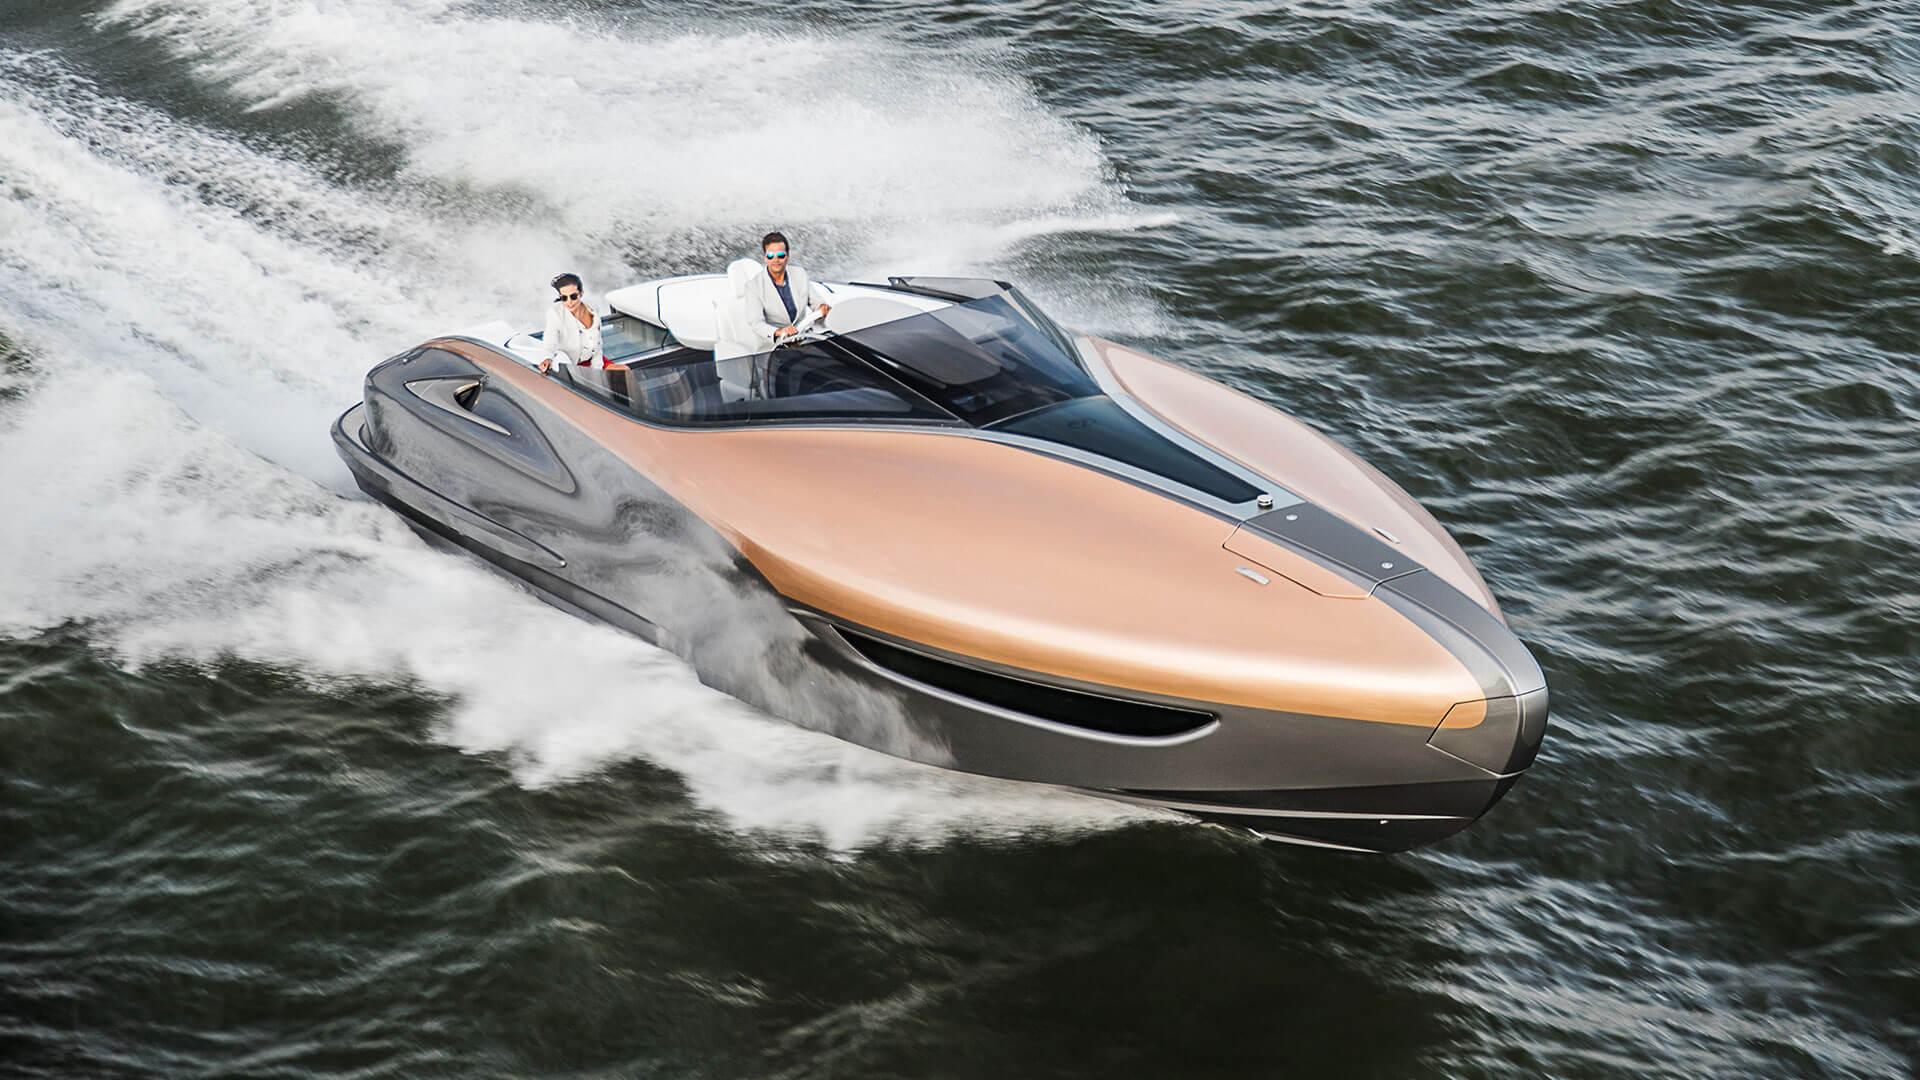 2017 lexus yacht hero01 1920x1080 tcm 3154 1037146